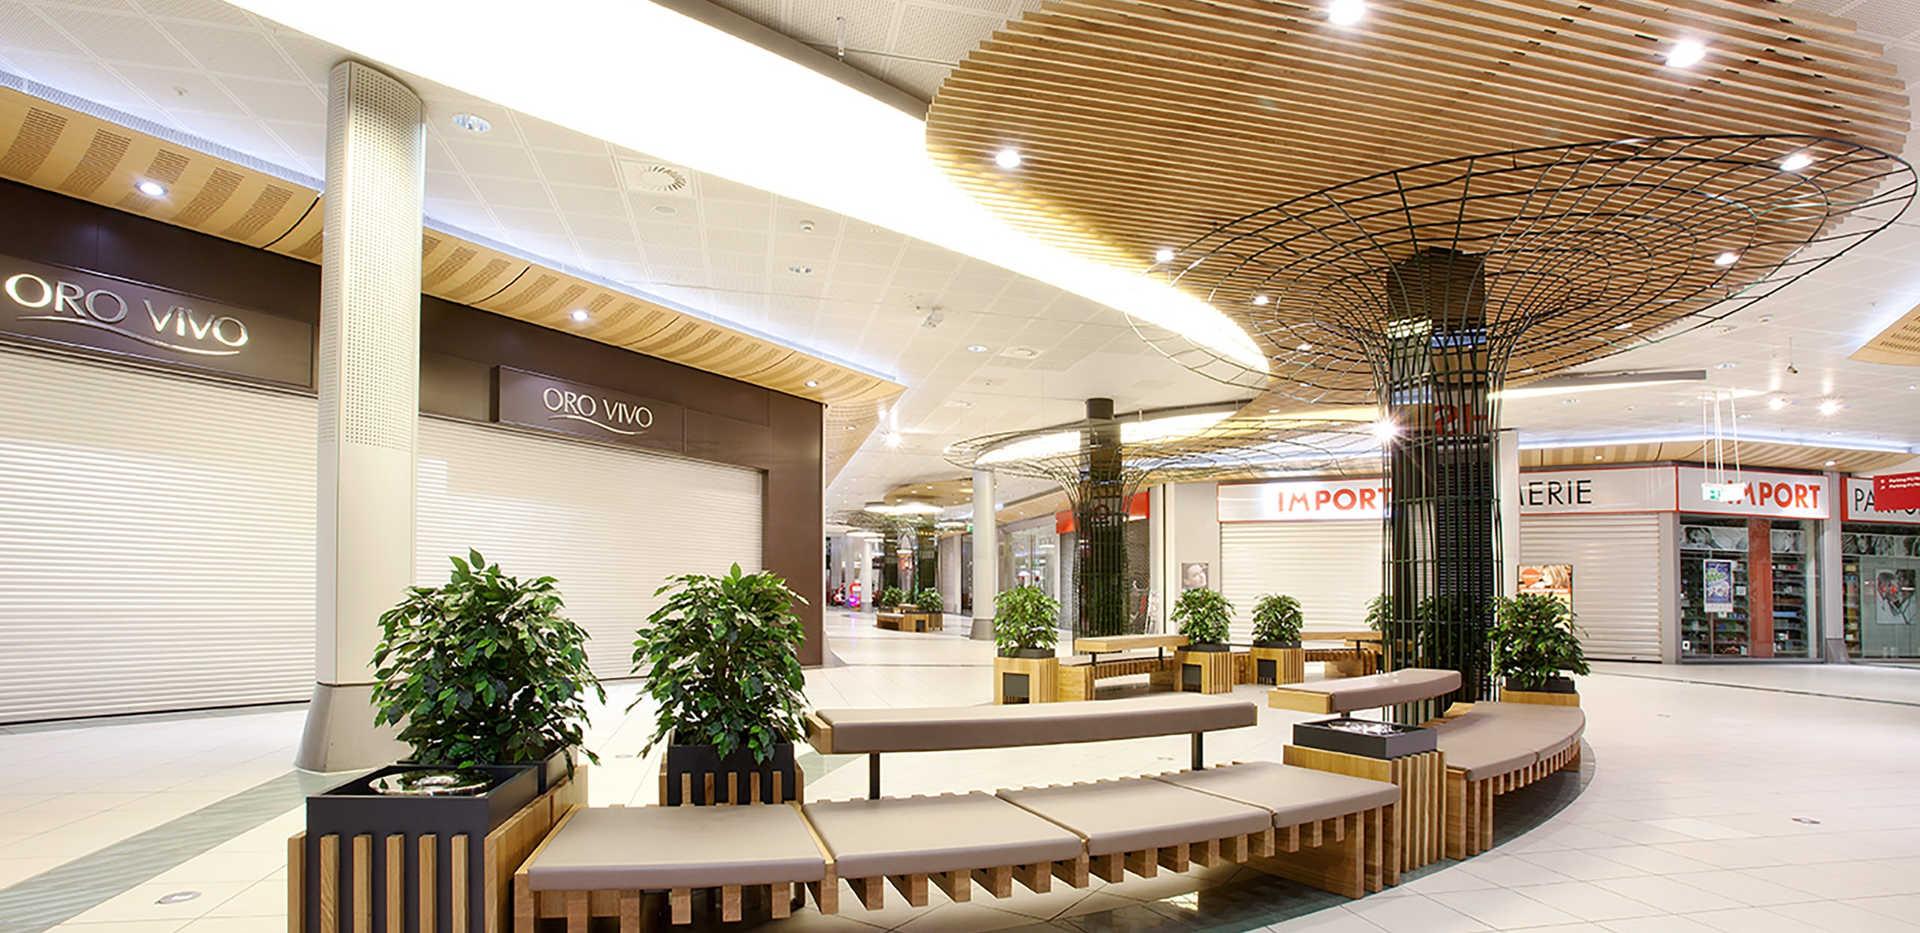 st-jakobs-shopping-032-eb337d32.jpg